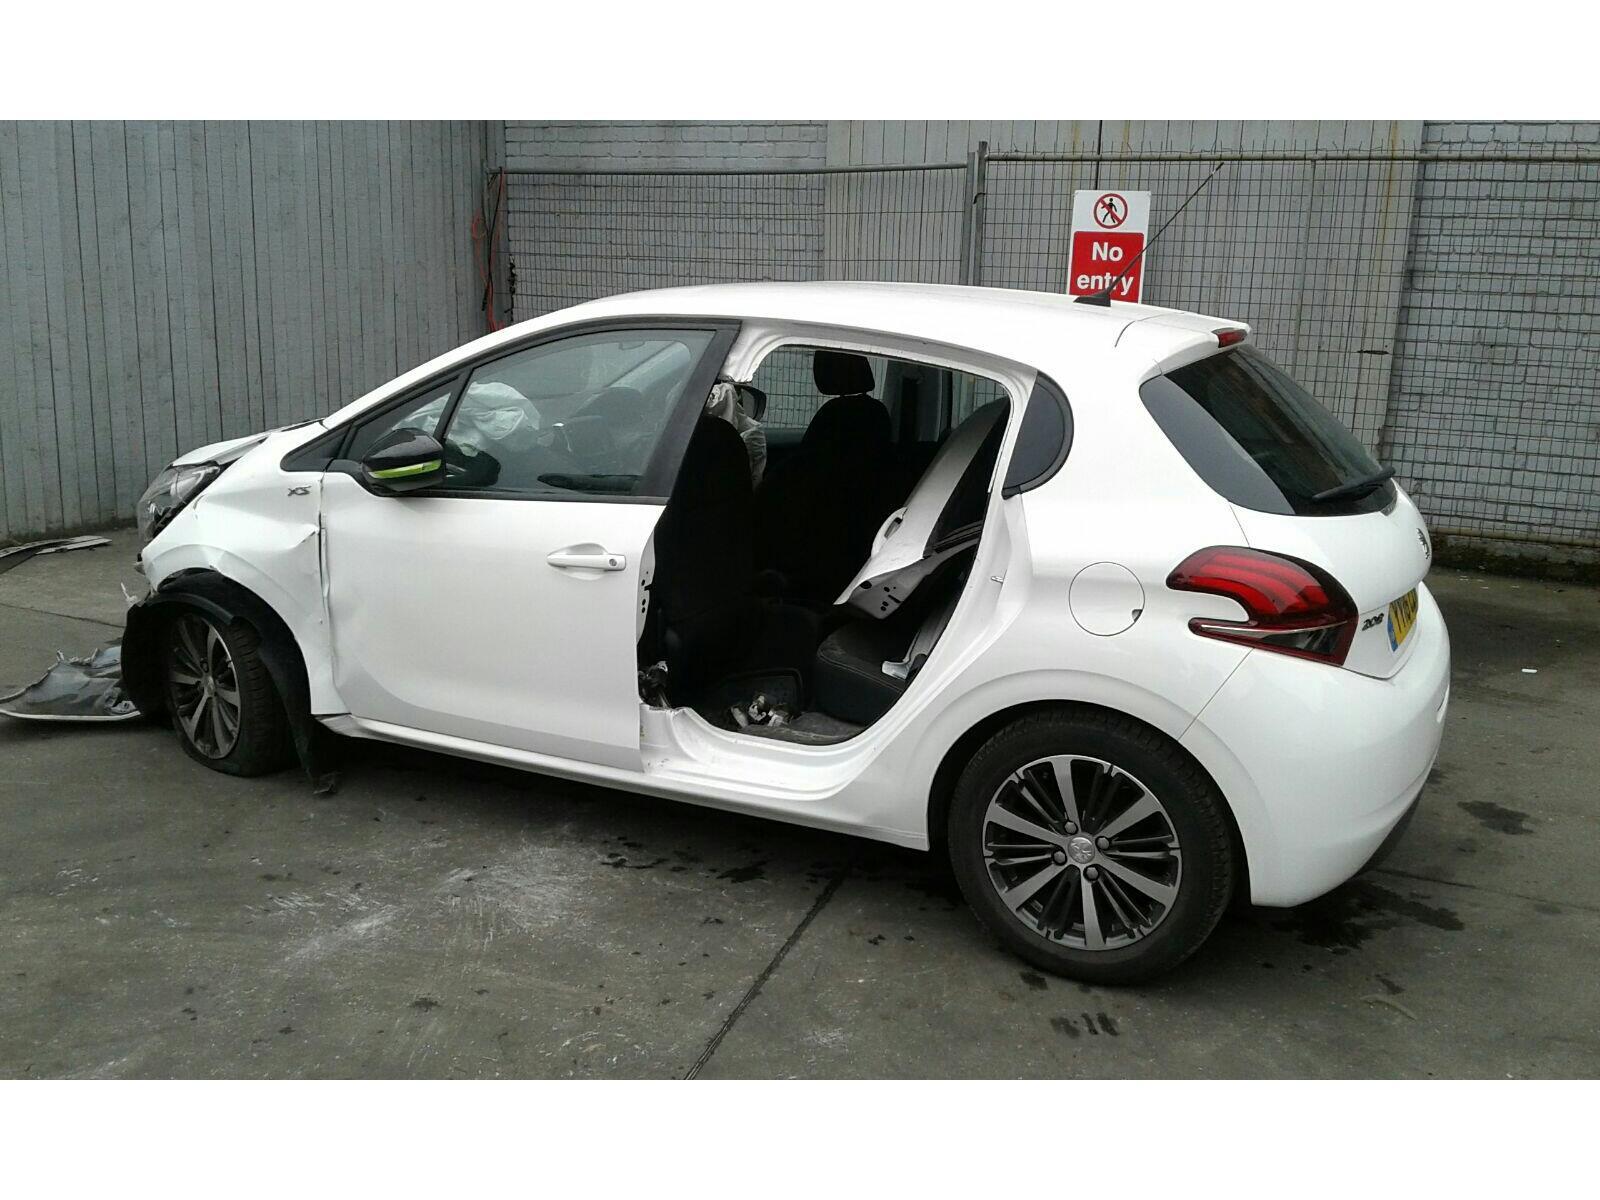 2016 peugeot 208 2015 on 5 door hatchback (petrol / manual) breaking